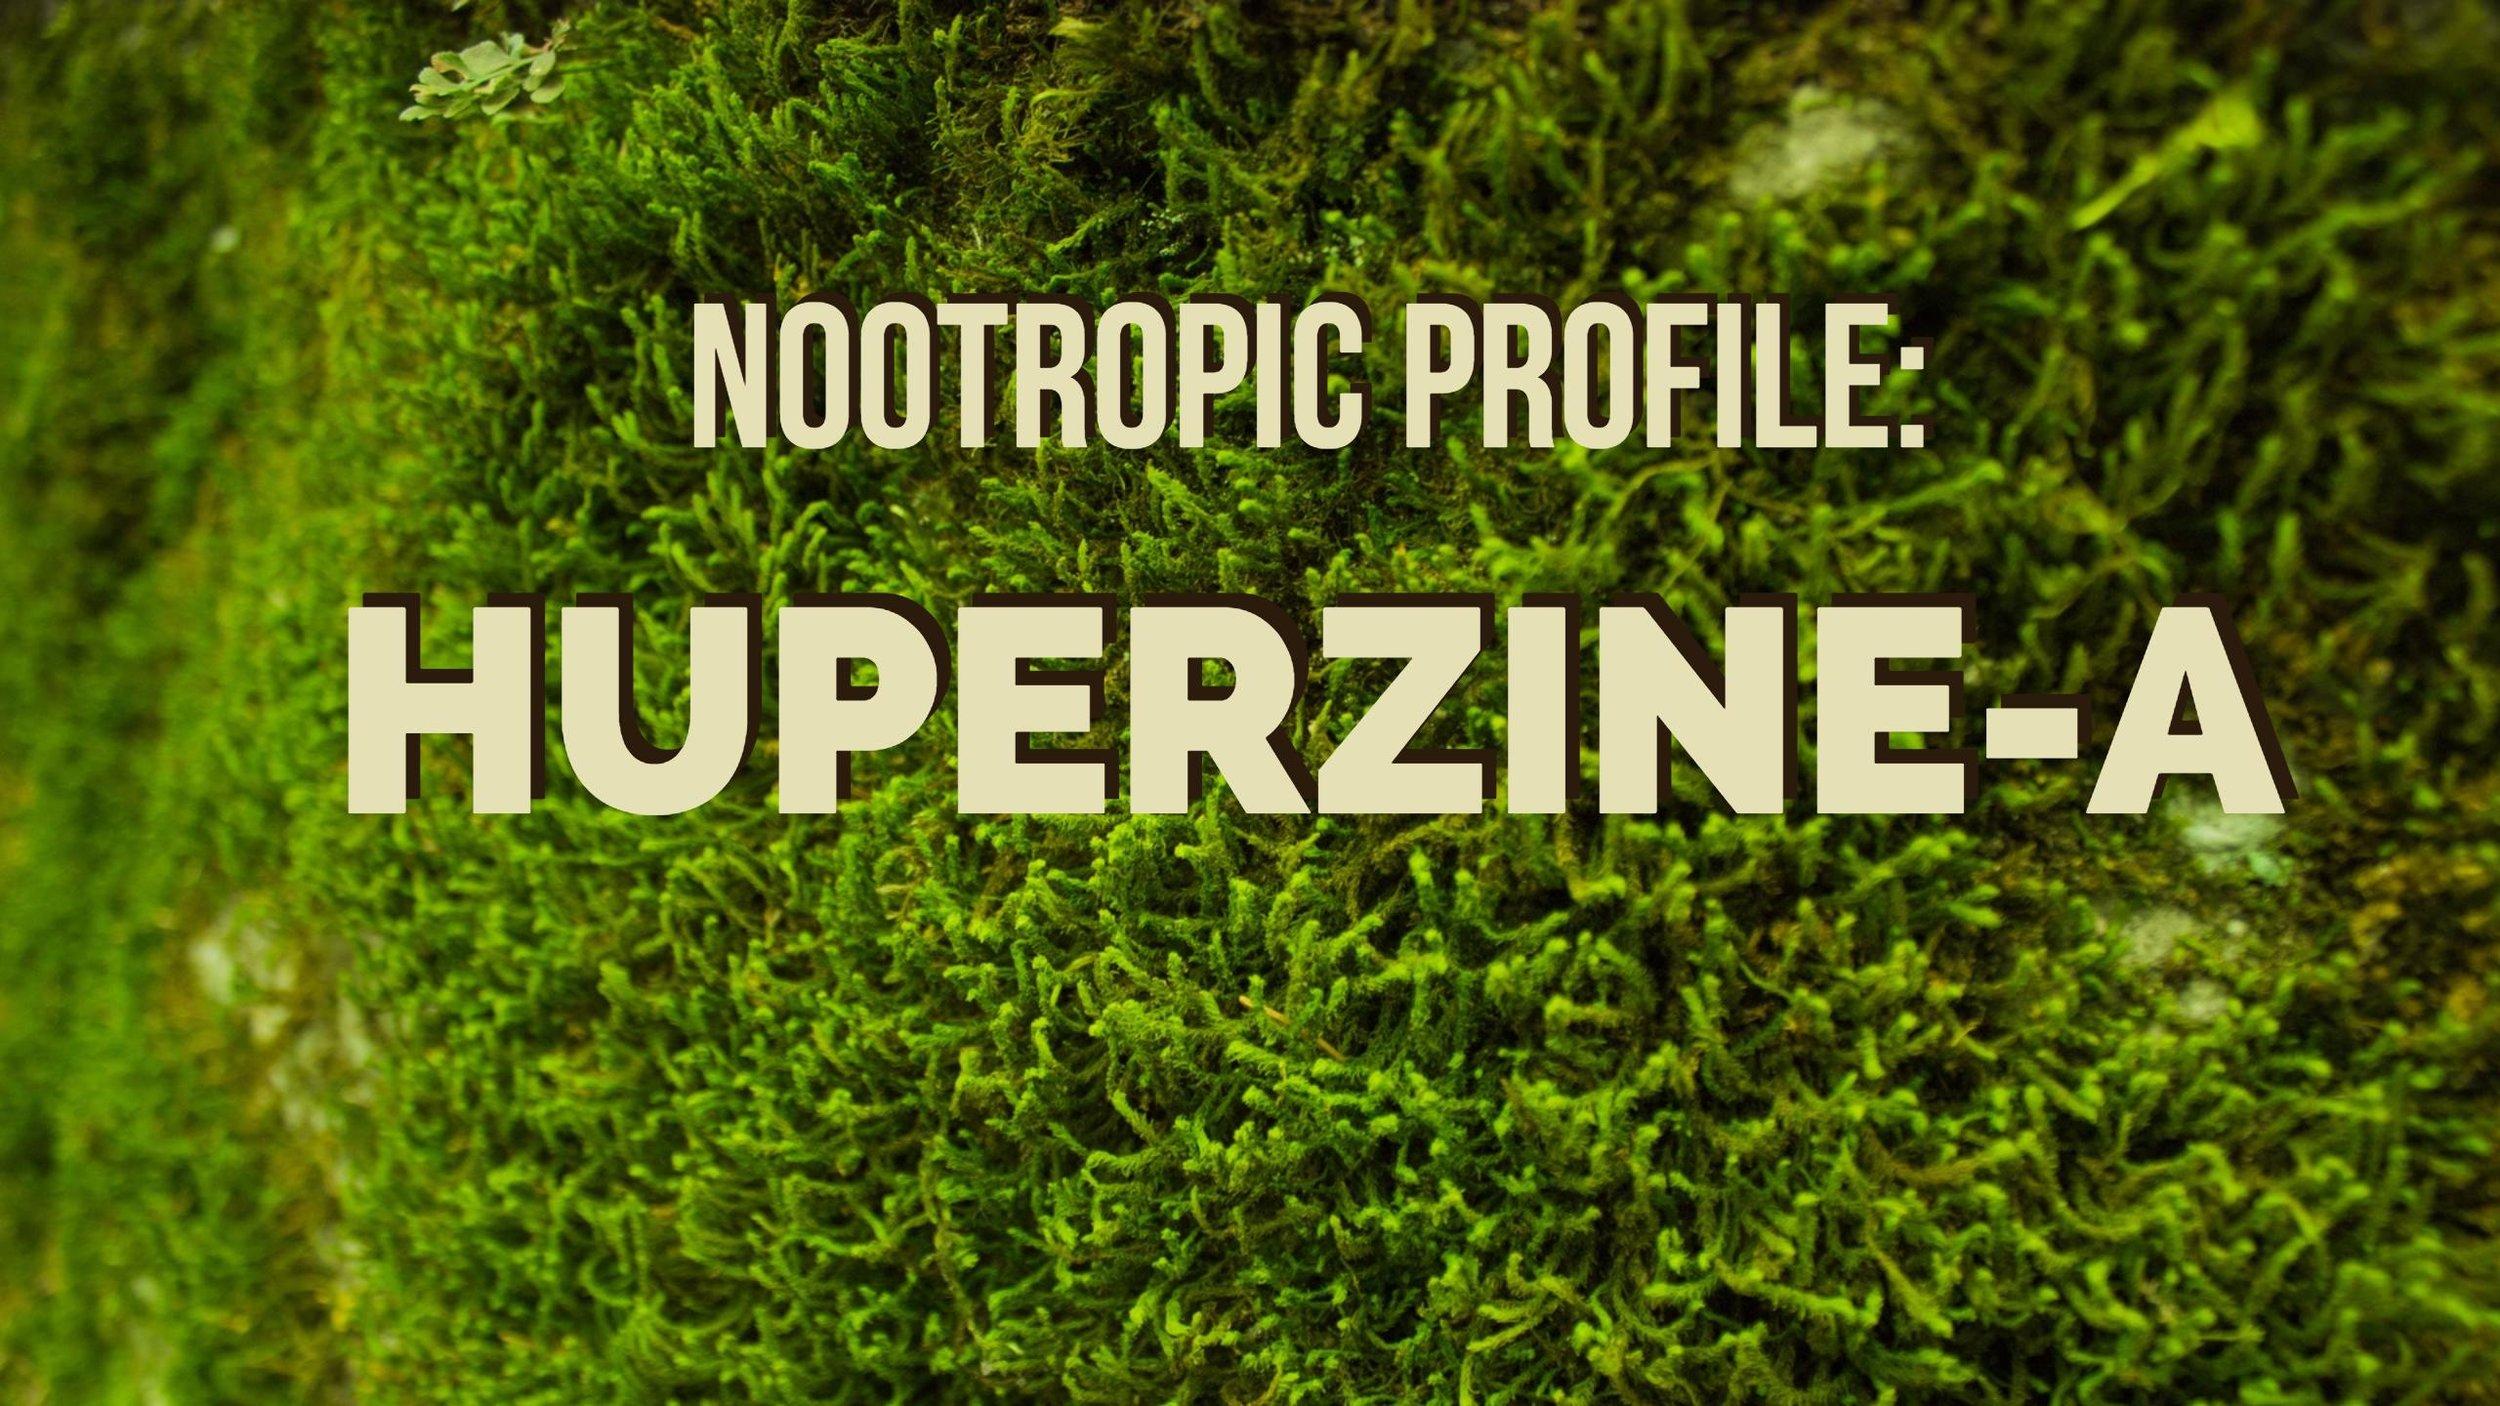 Nootropic Profile Huperzine A Huperzia Serrata The Sunlight